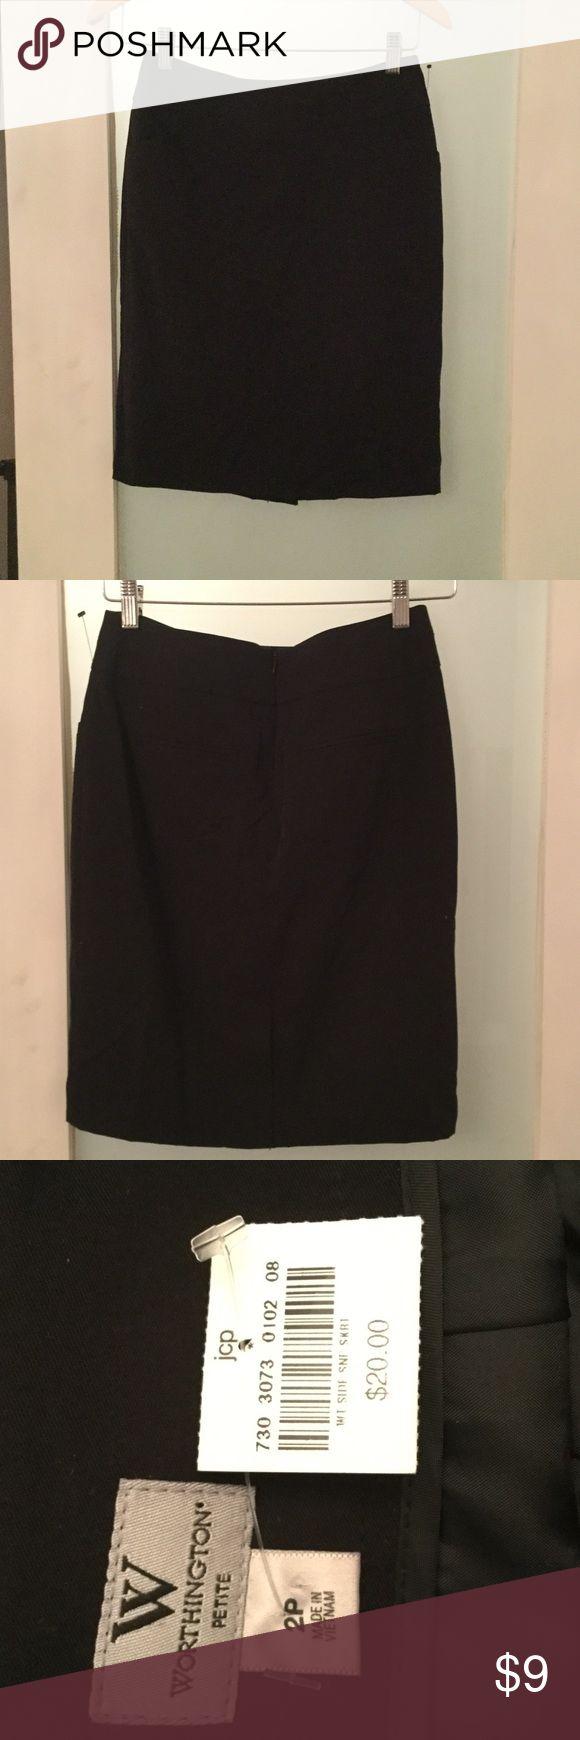 Worthington Petite black dress skirt with pockets New with tags. Nice dress skirt with slit in back Size 2P Worthington Skirts Midi